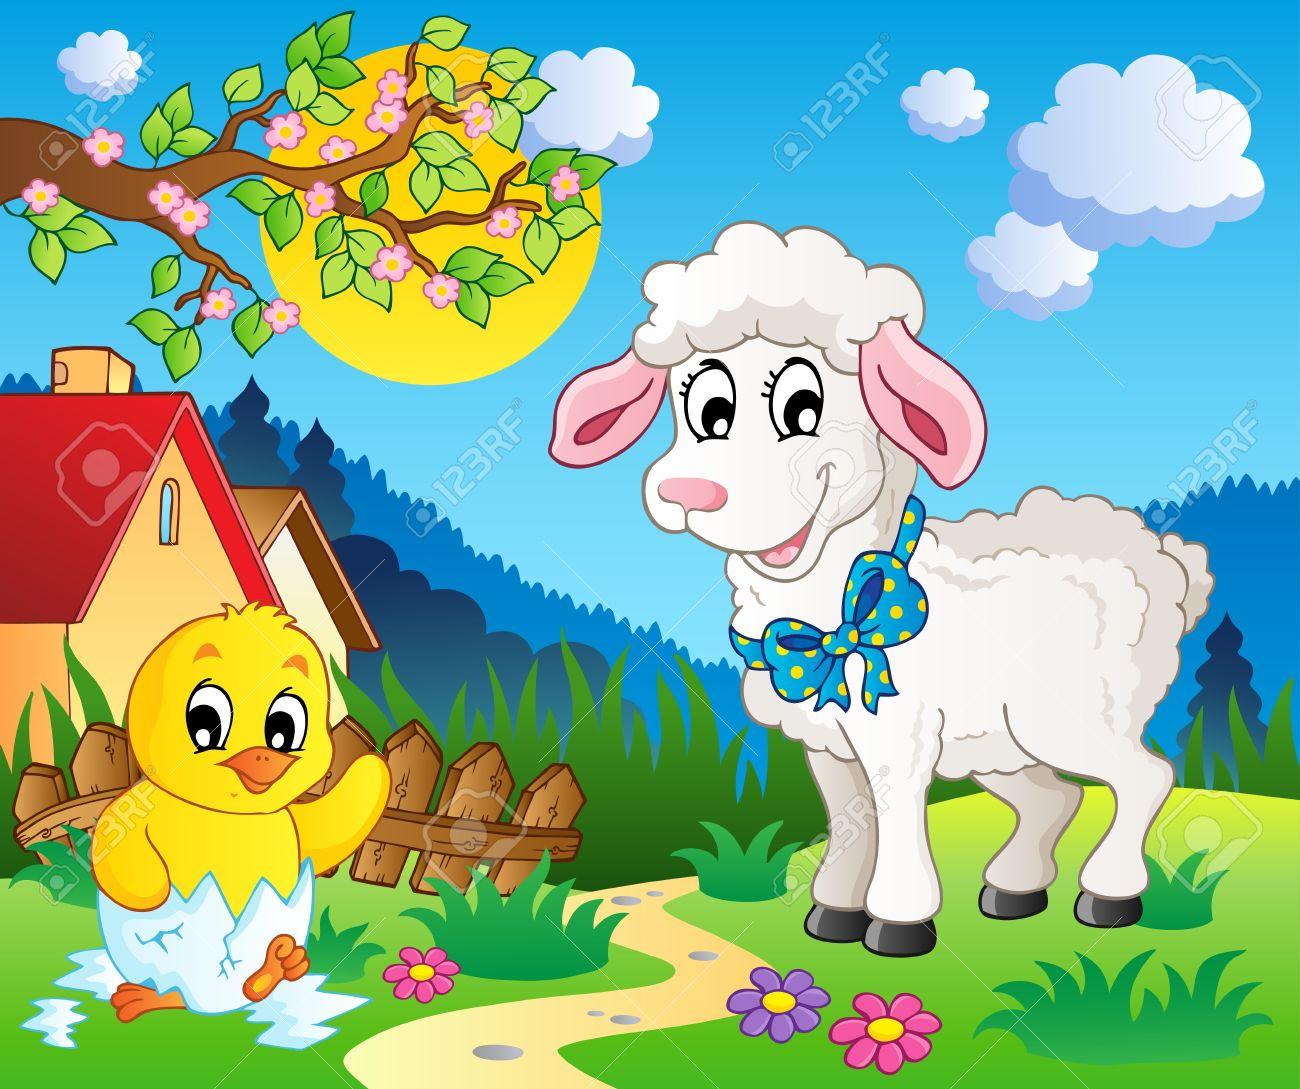 Scene with spring season theme 3 - vector illustration Stock Vector - 12895929